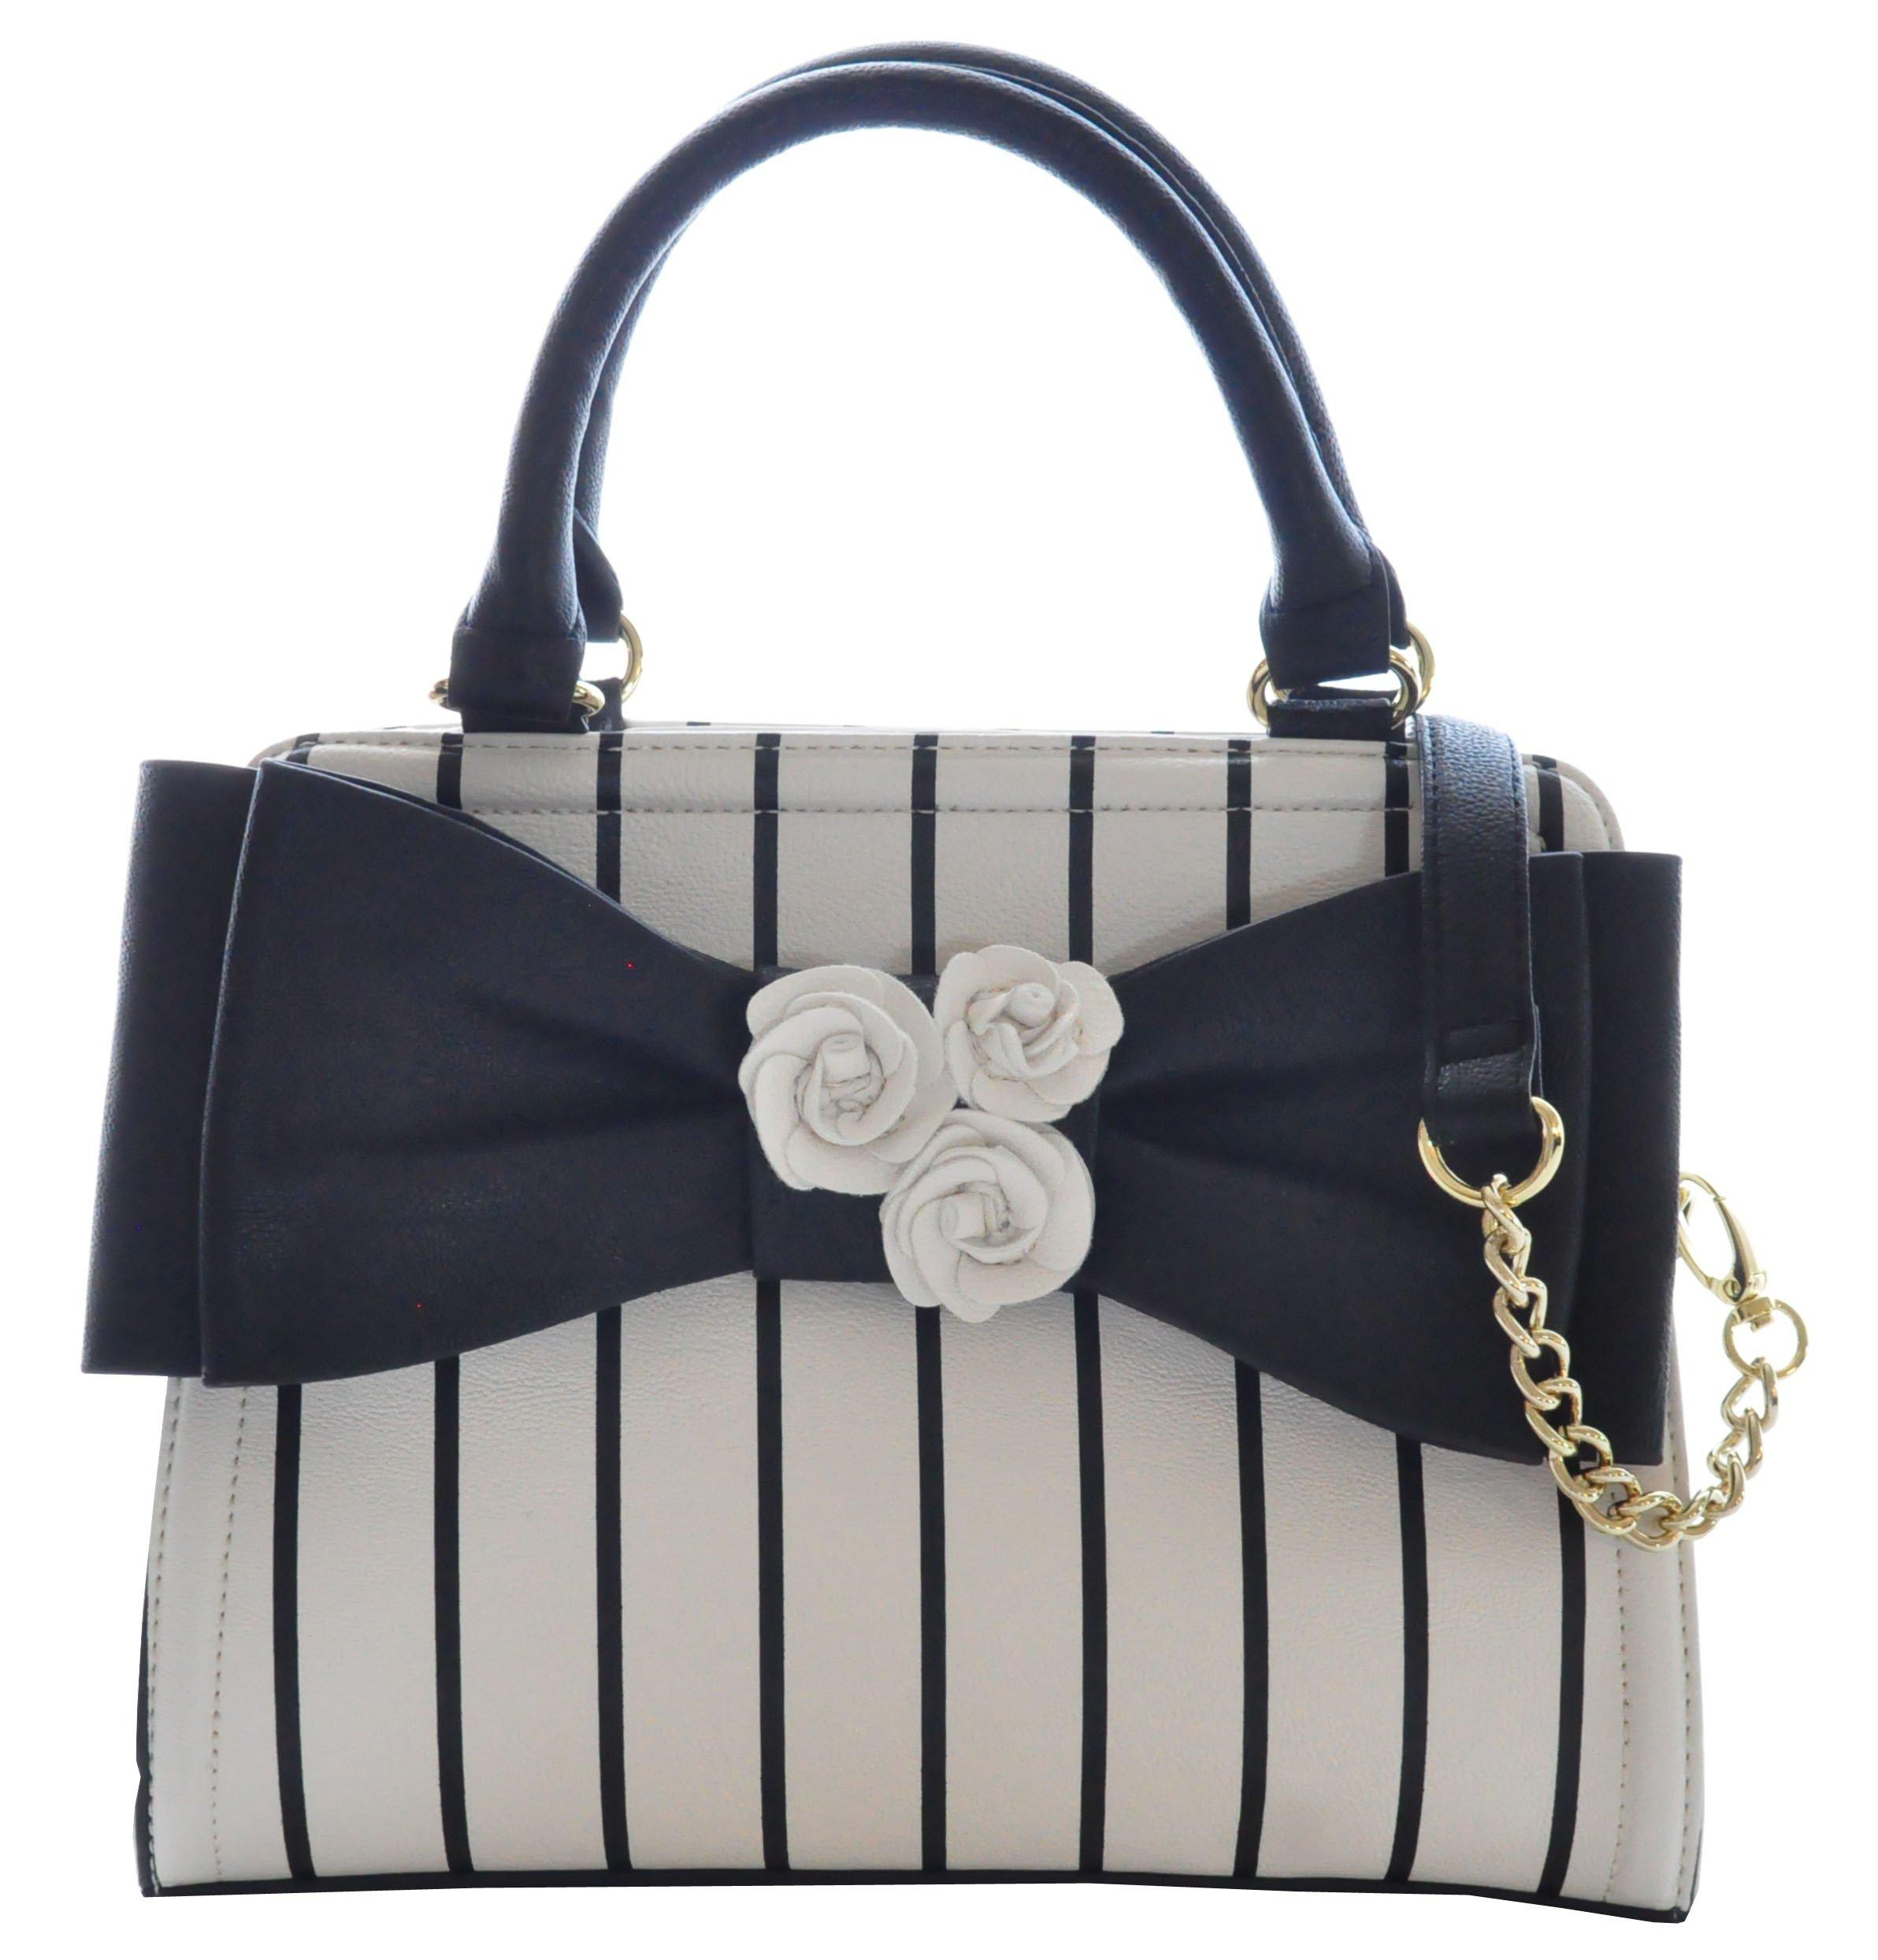 Betsey Johnson Bow Satchel Bag, Stripe